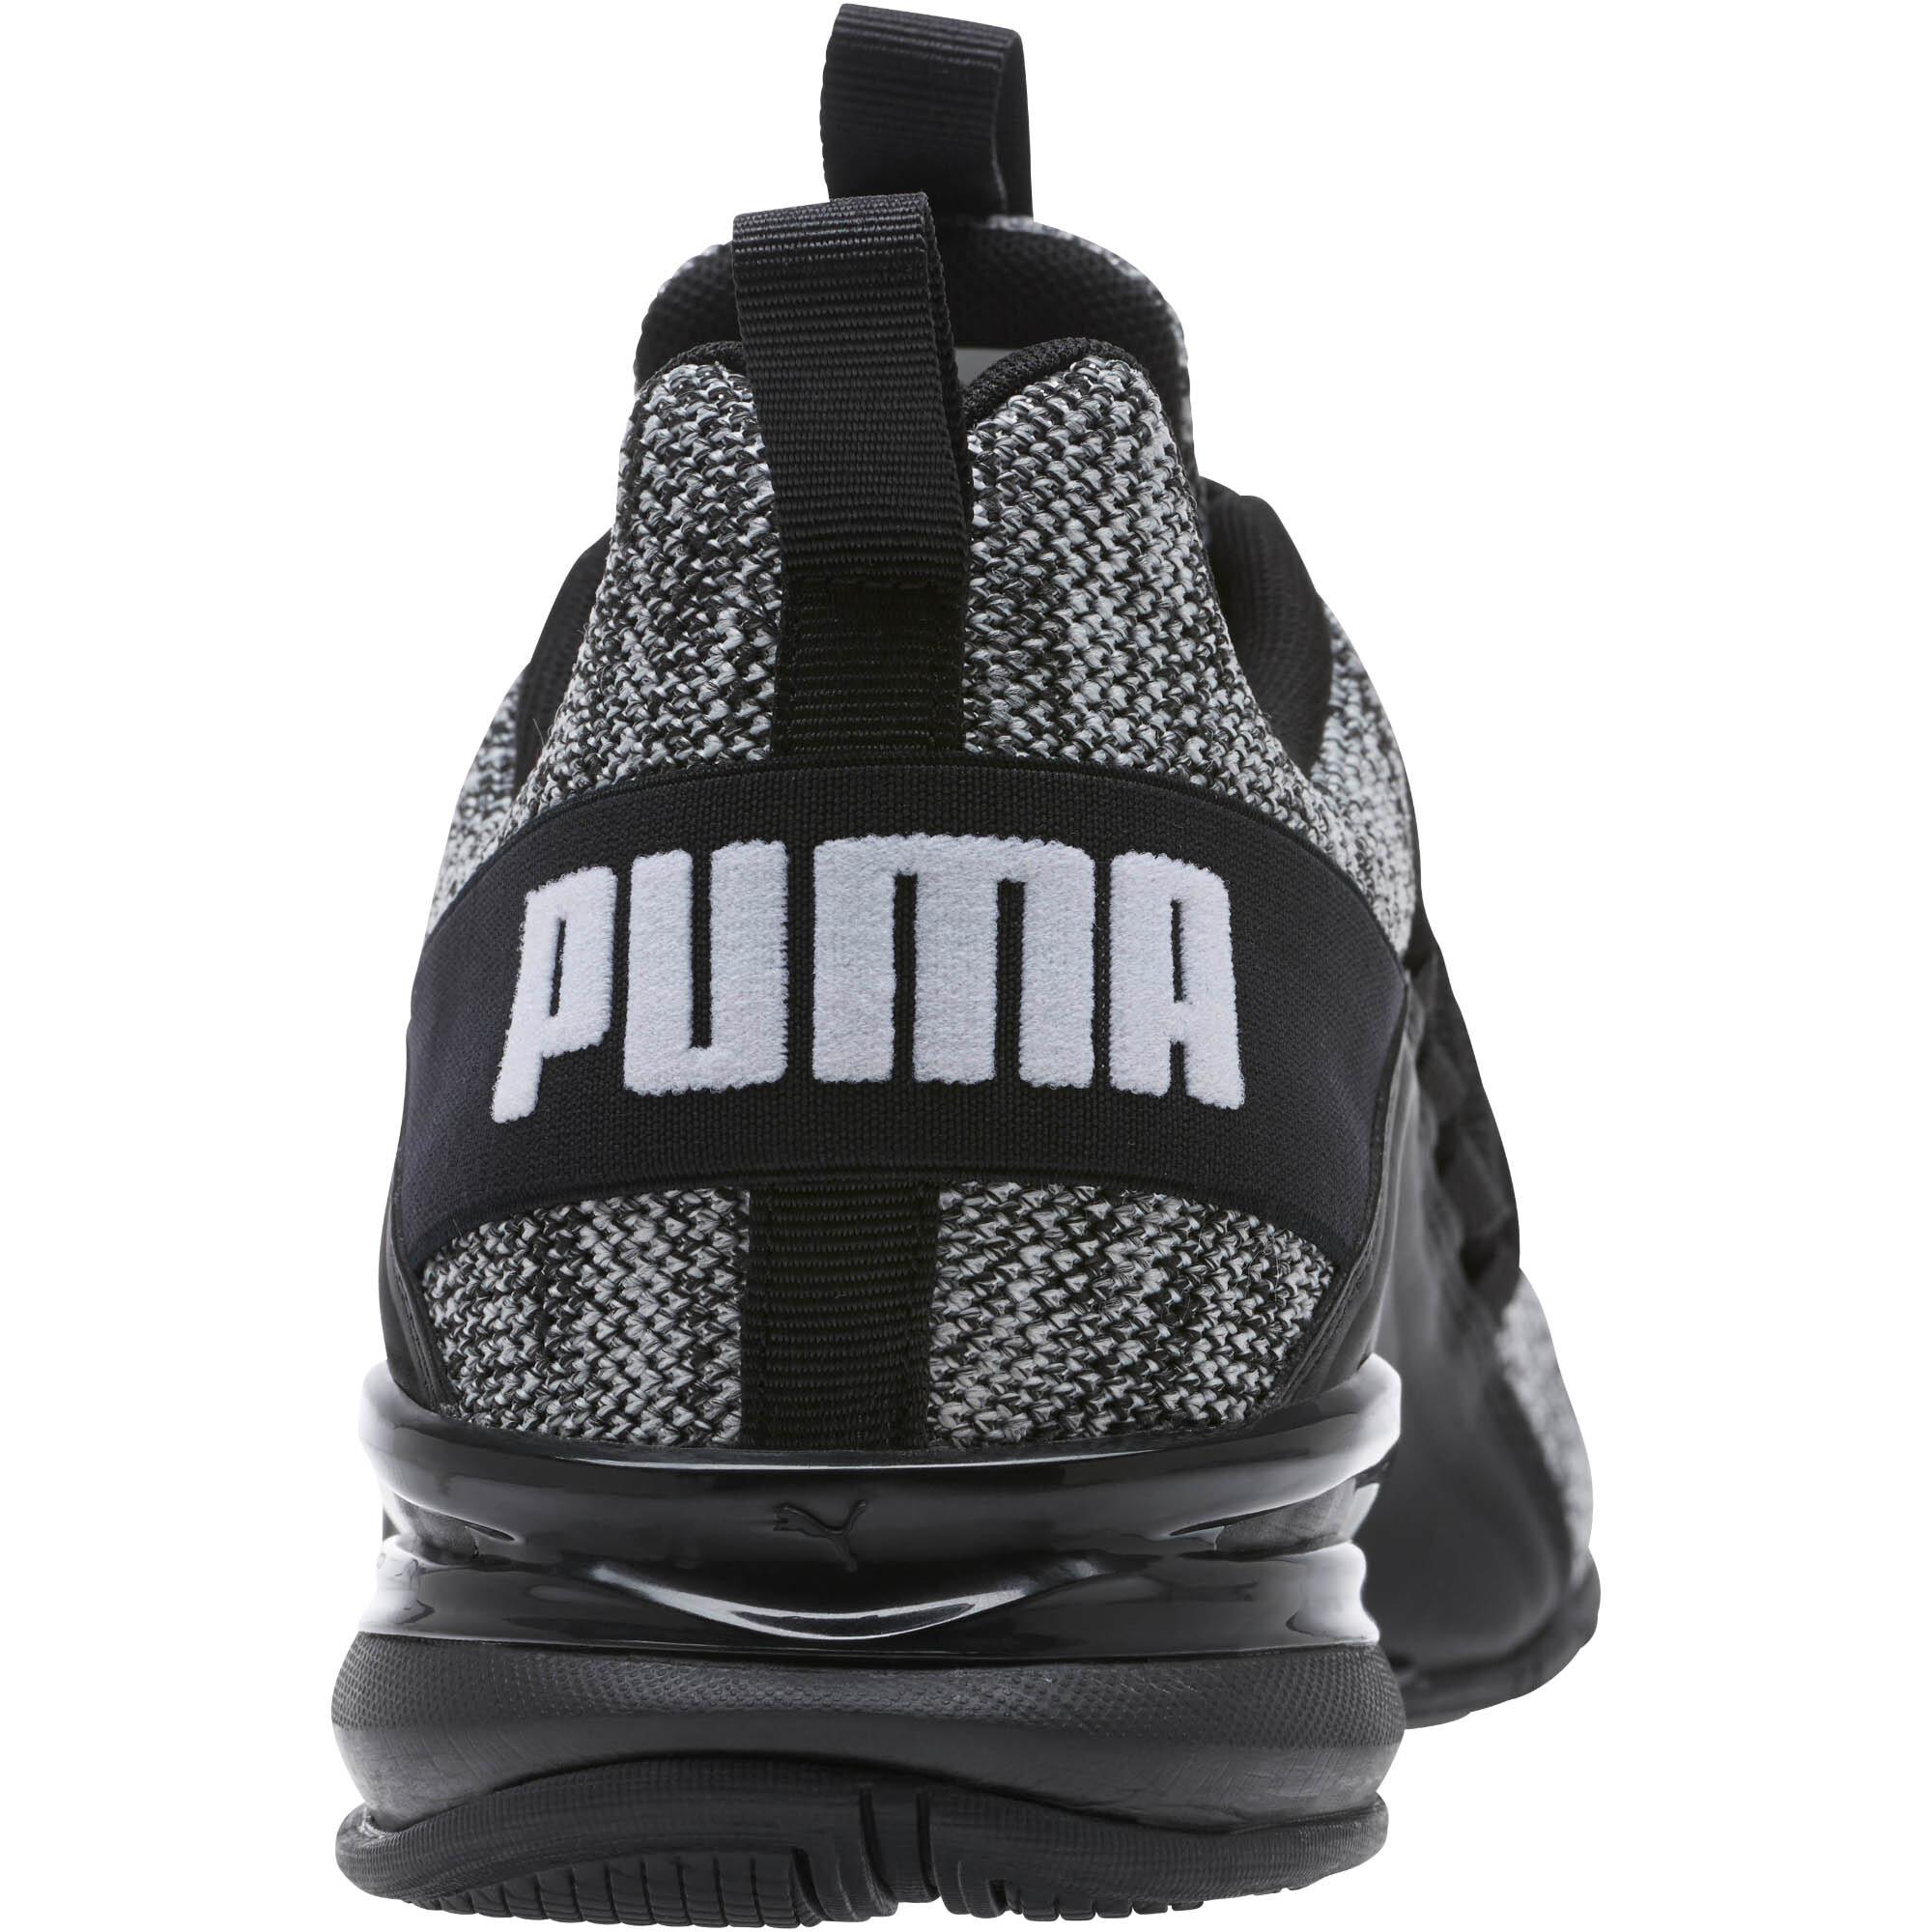 PUMA-Axelion-Men-039-s-Training-Shoes-Men-Shoe-Running thumbnail 17